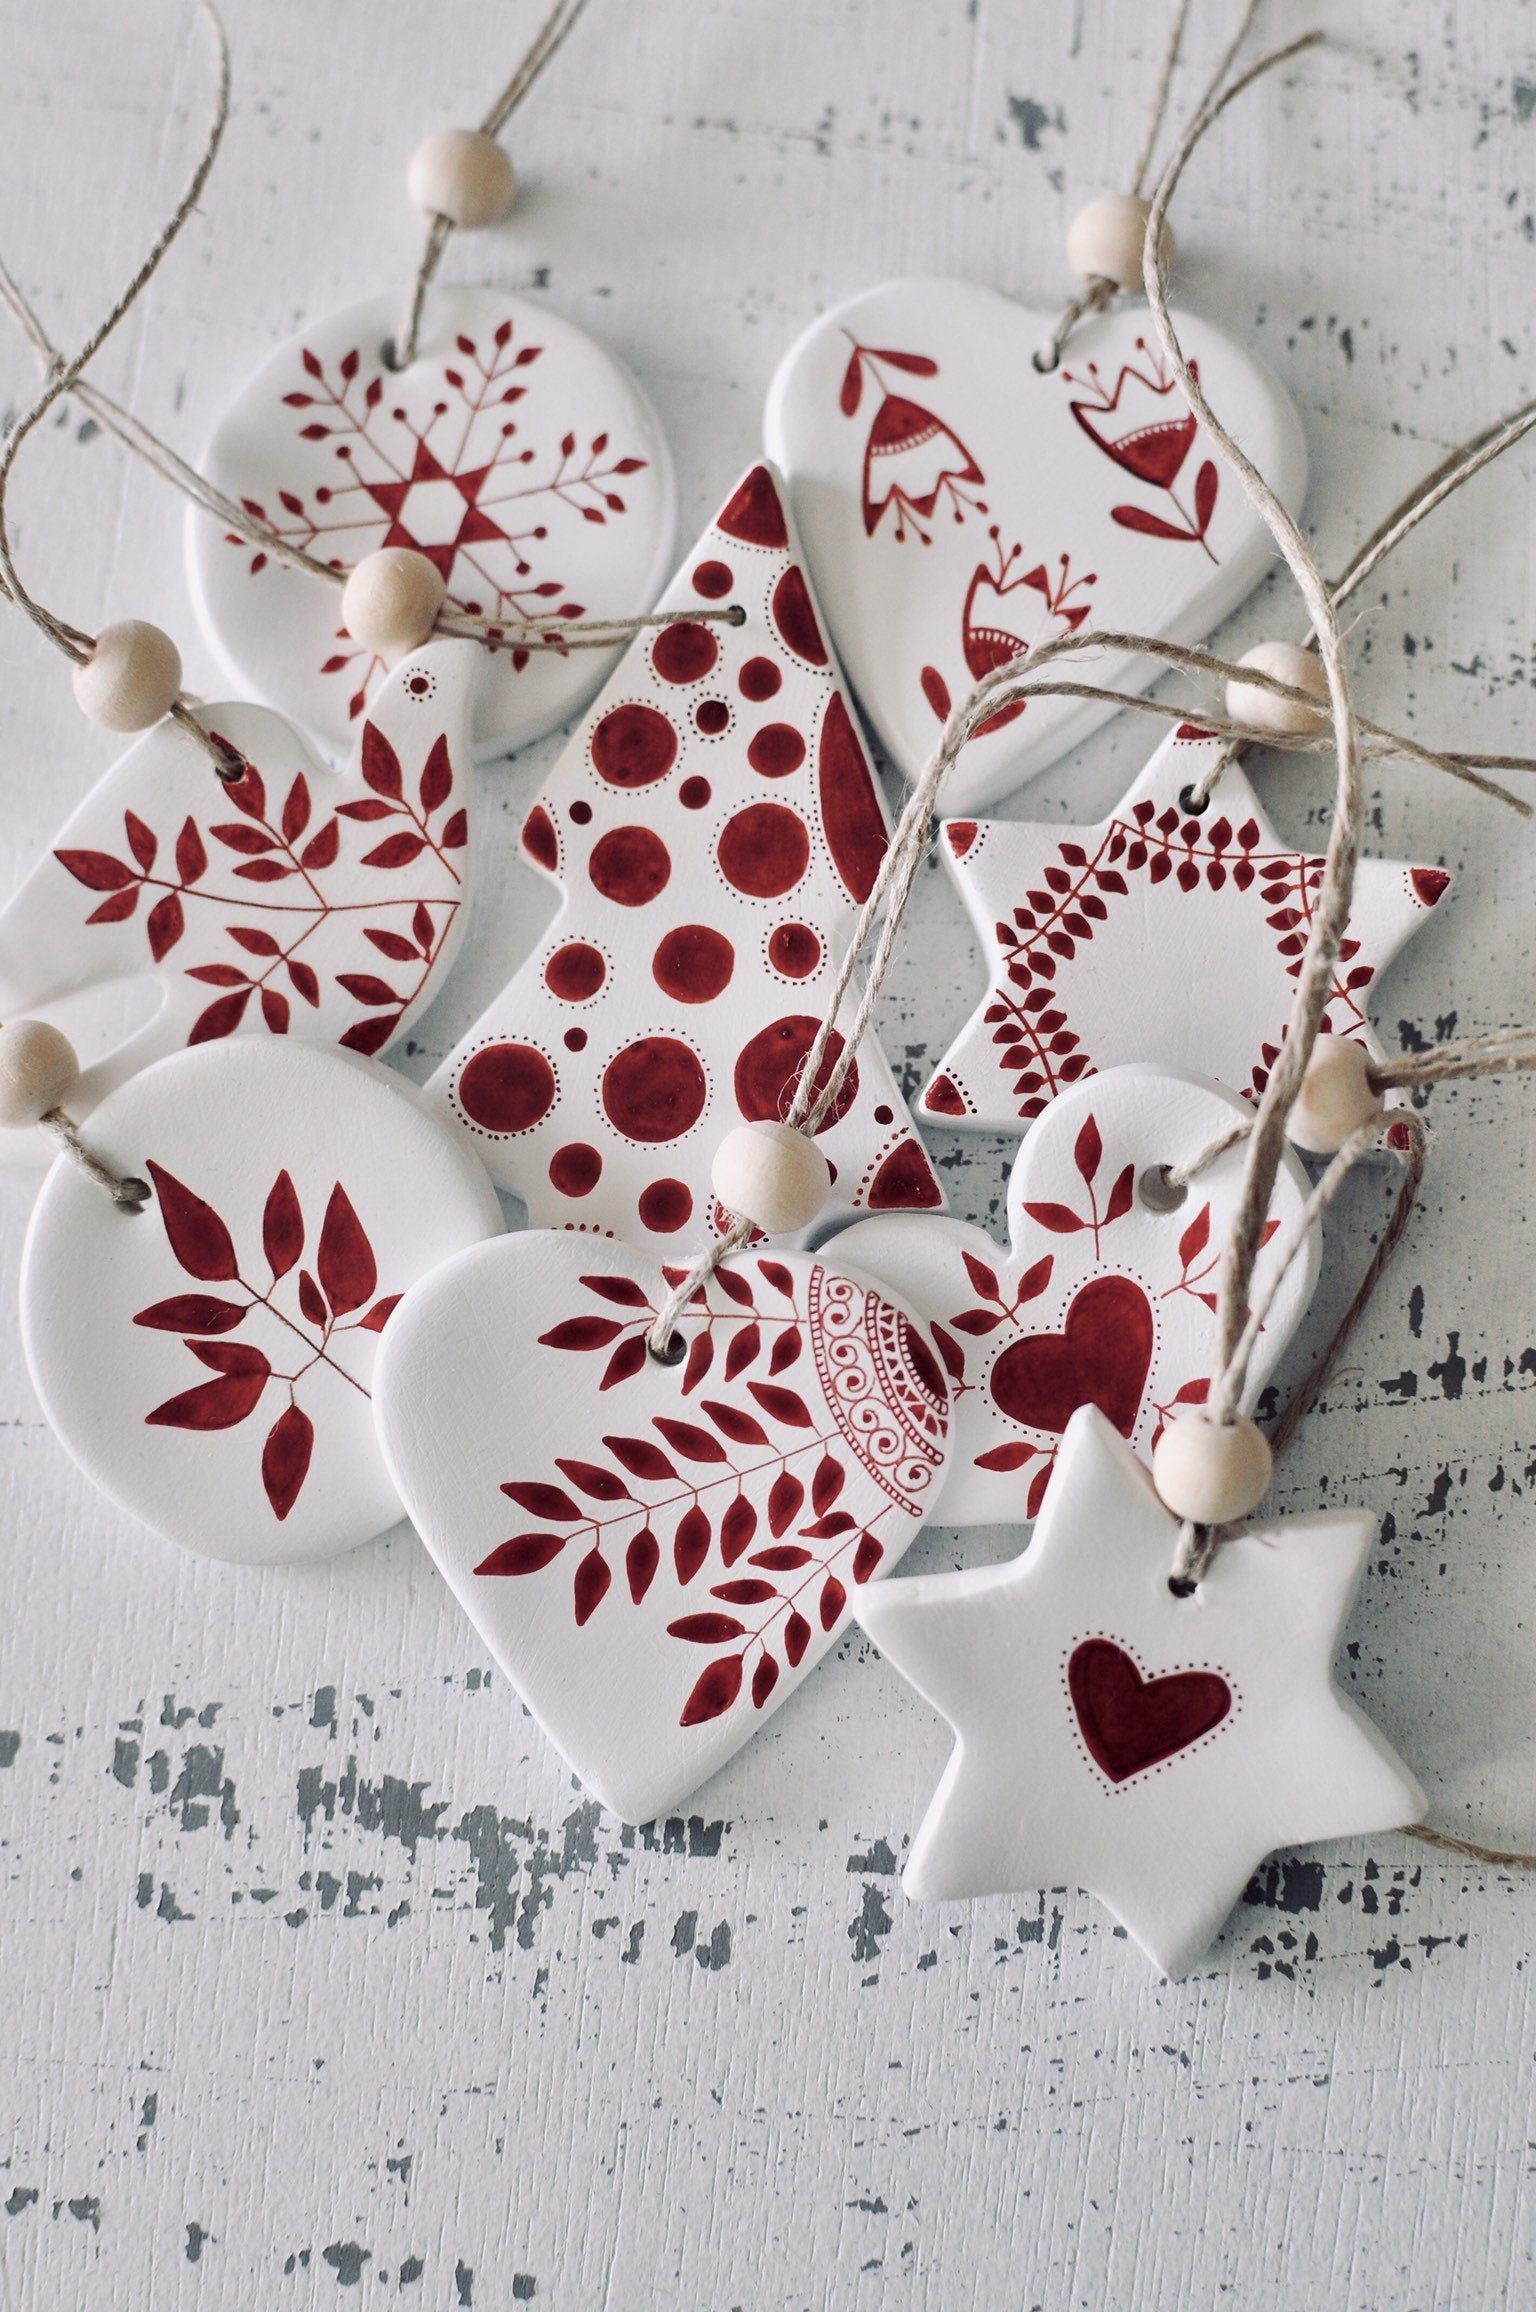 Set Of 9 Christmas Tree Decorations Ornaments Scandinavian Christmas Ceramic Ornaments Holiday Decor Nordic Decor Hygge Holiday Decorations In 2020 Ceramic Christmas Decorations Clay Christmas Decorations Christmas Clay